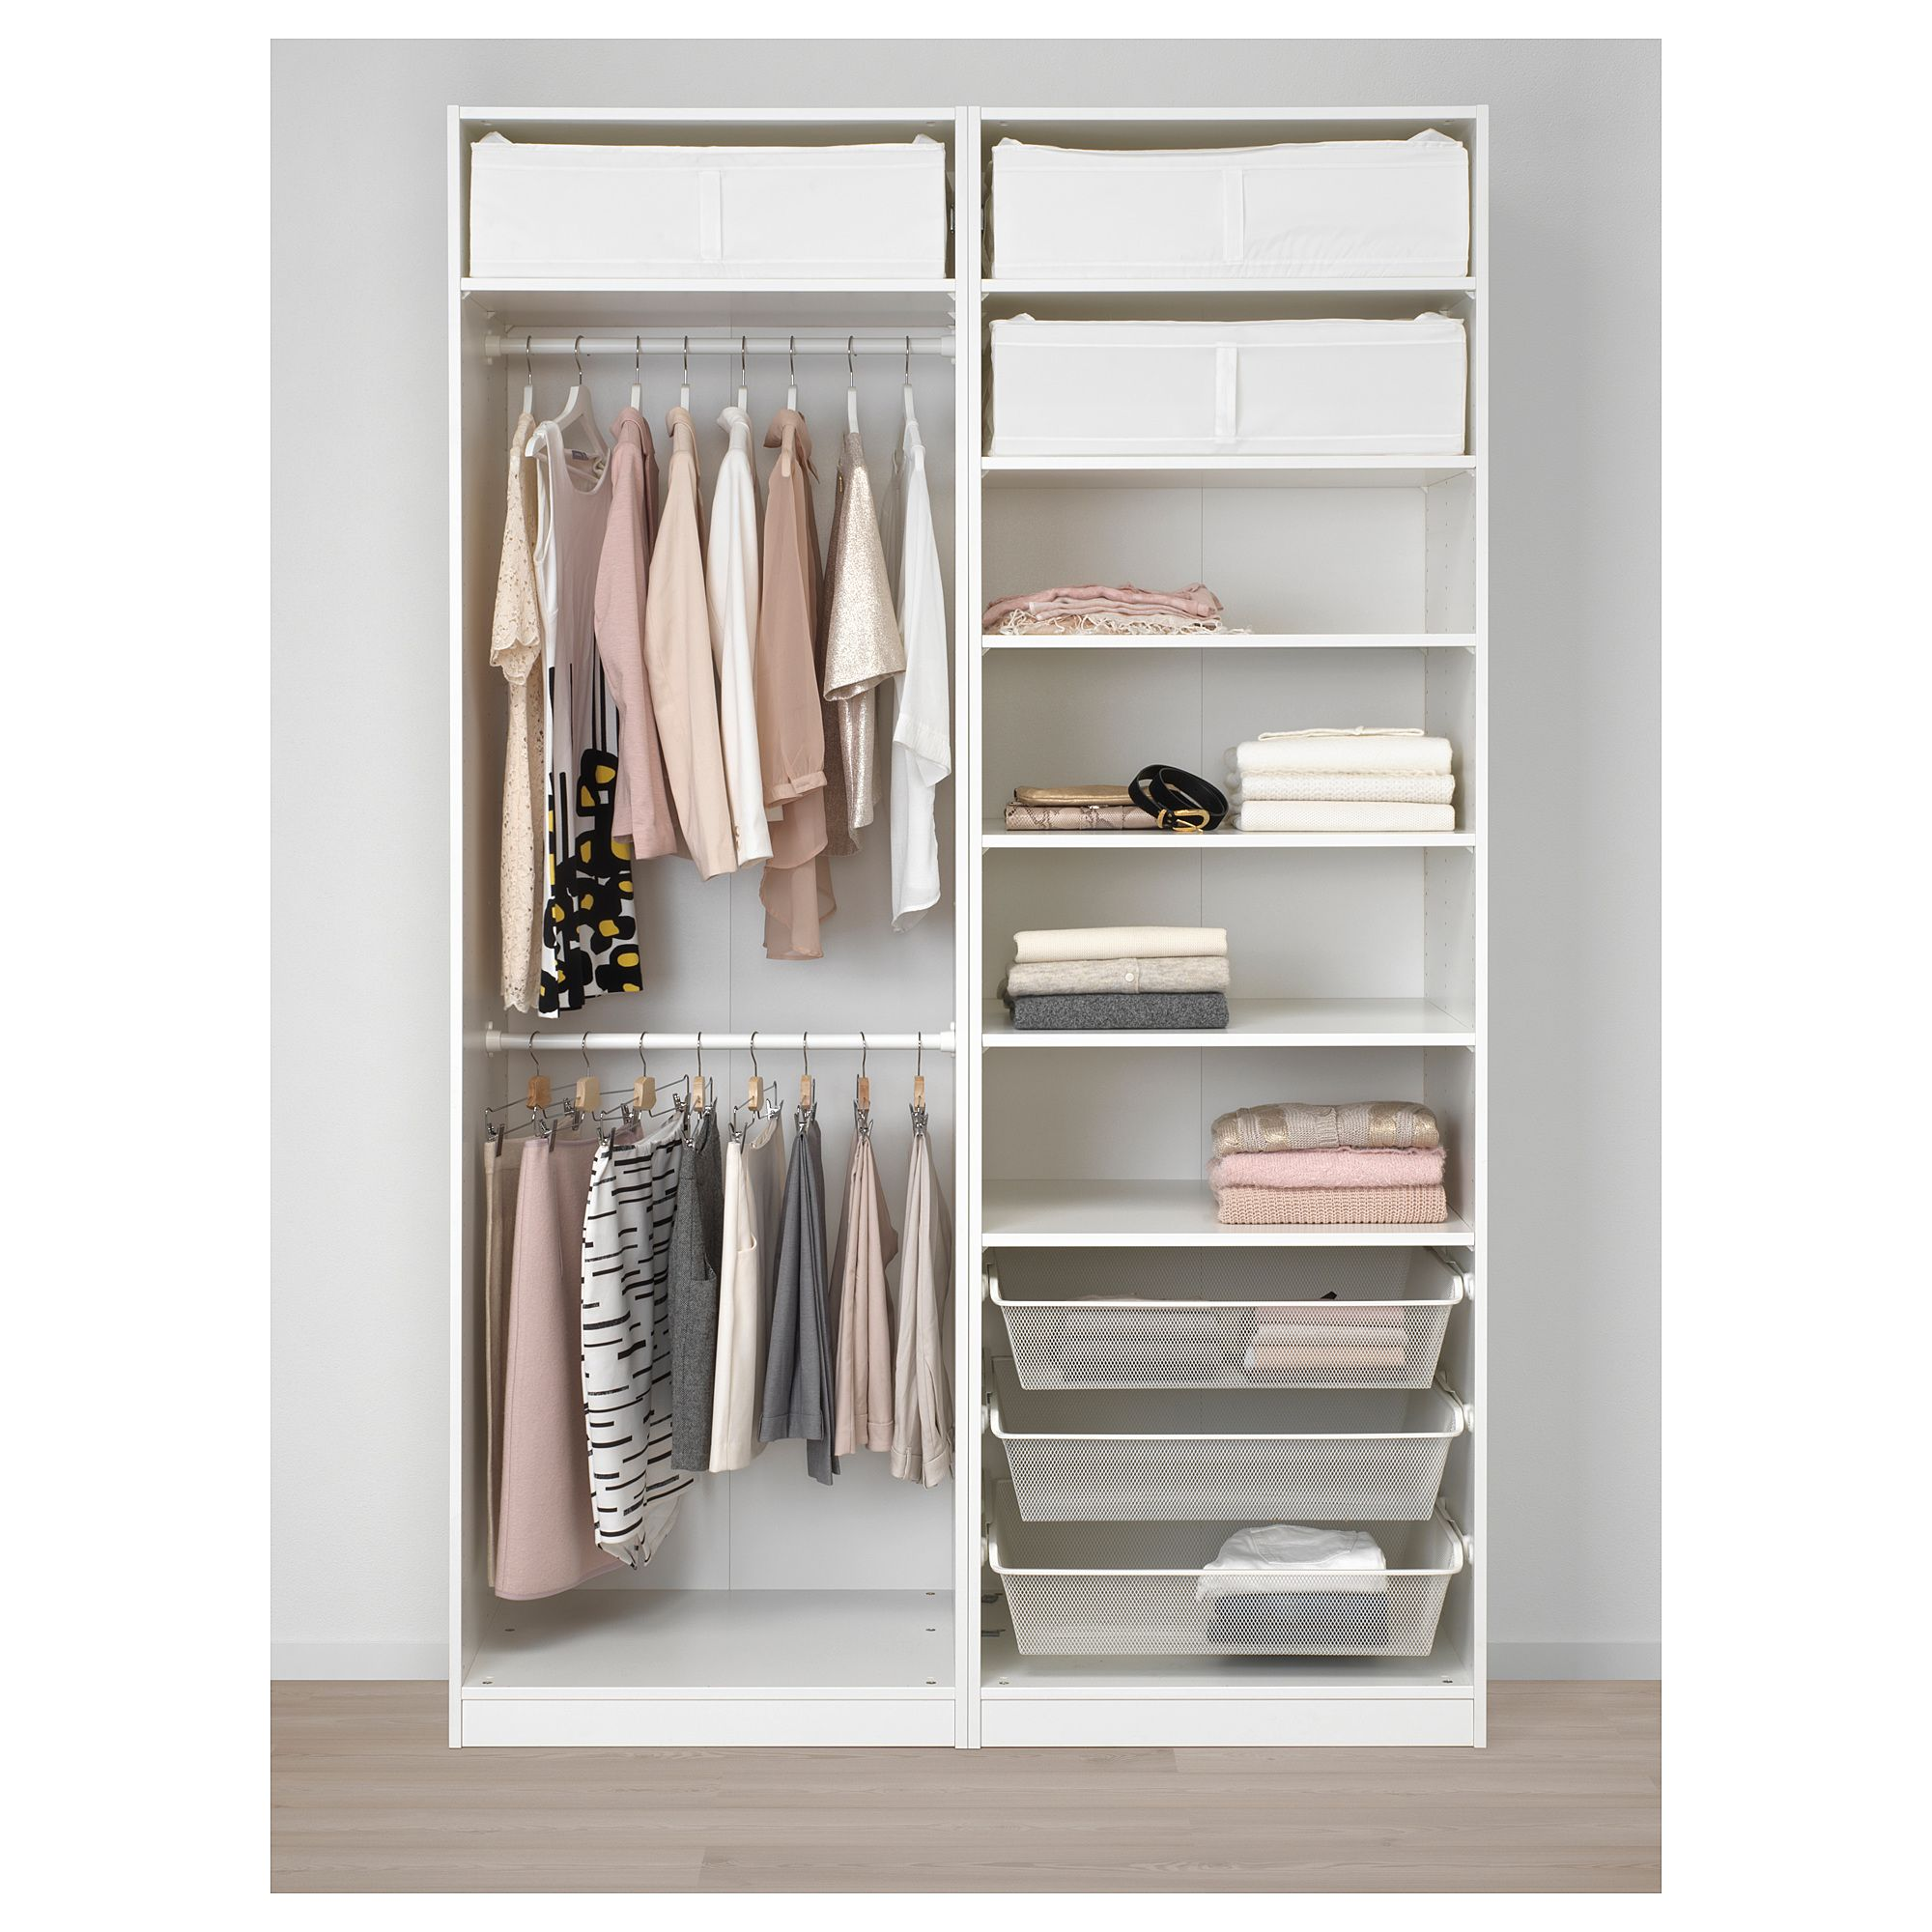 Furniture Home Furnishings Find Your Inspiration Ikea Pax Wardrobe Ikea Closet Organizer Closet Bedroom